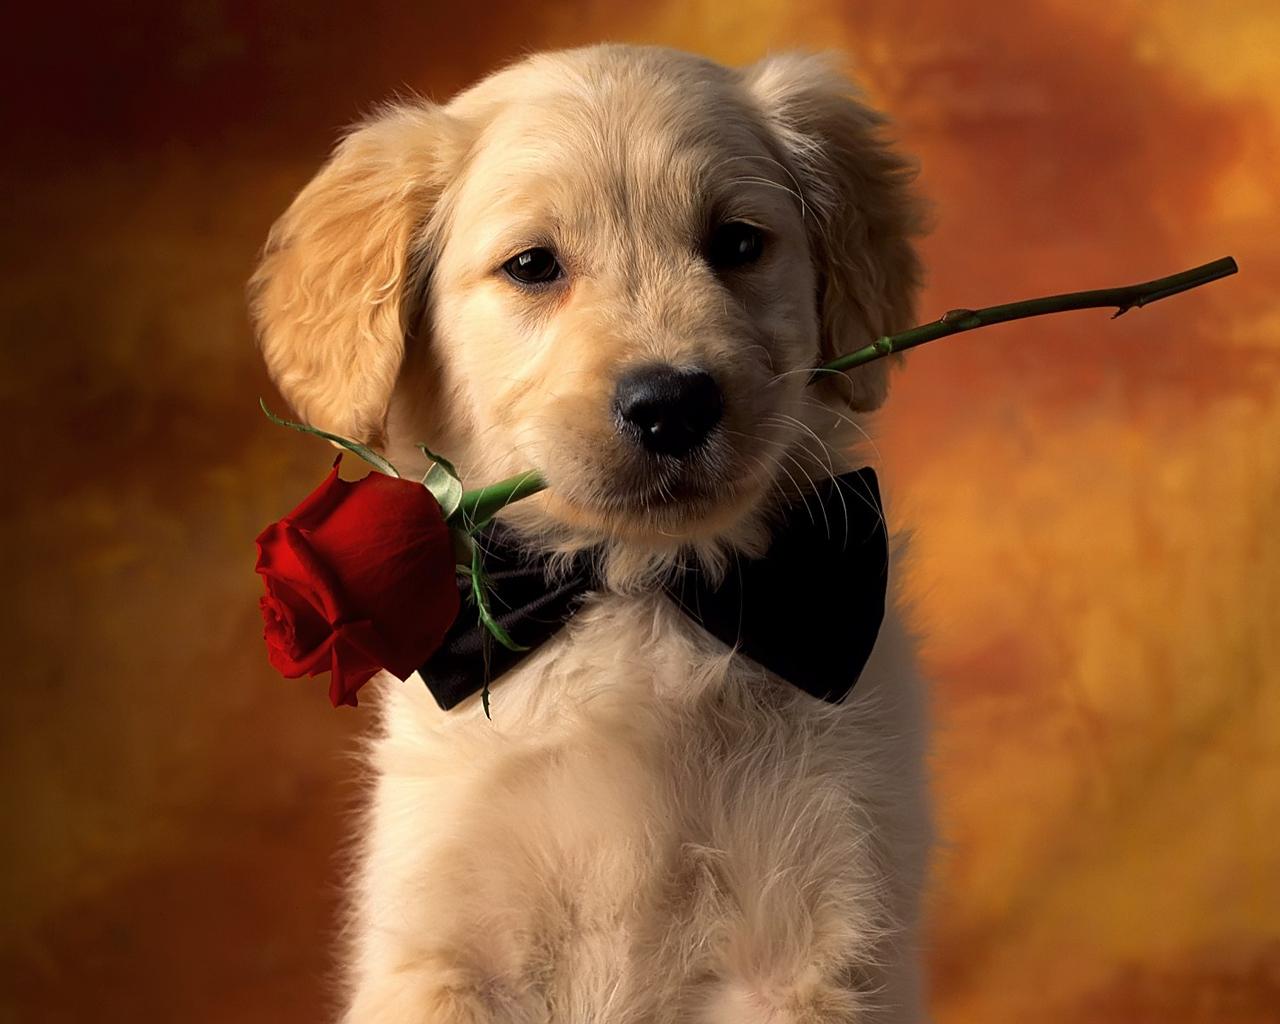 Gambar Anak Anjing Yang Lucu Lucu Dan Imut Wallpaper